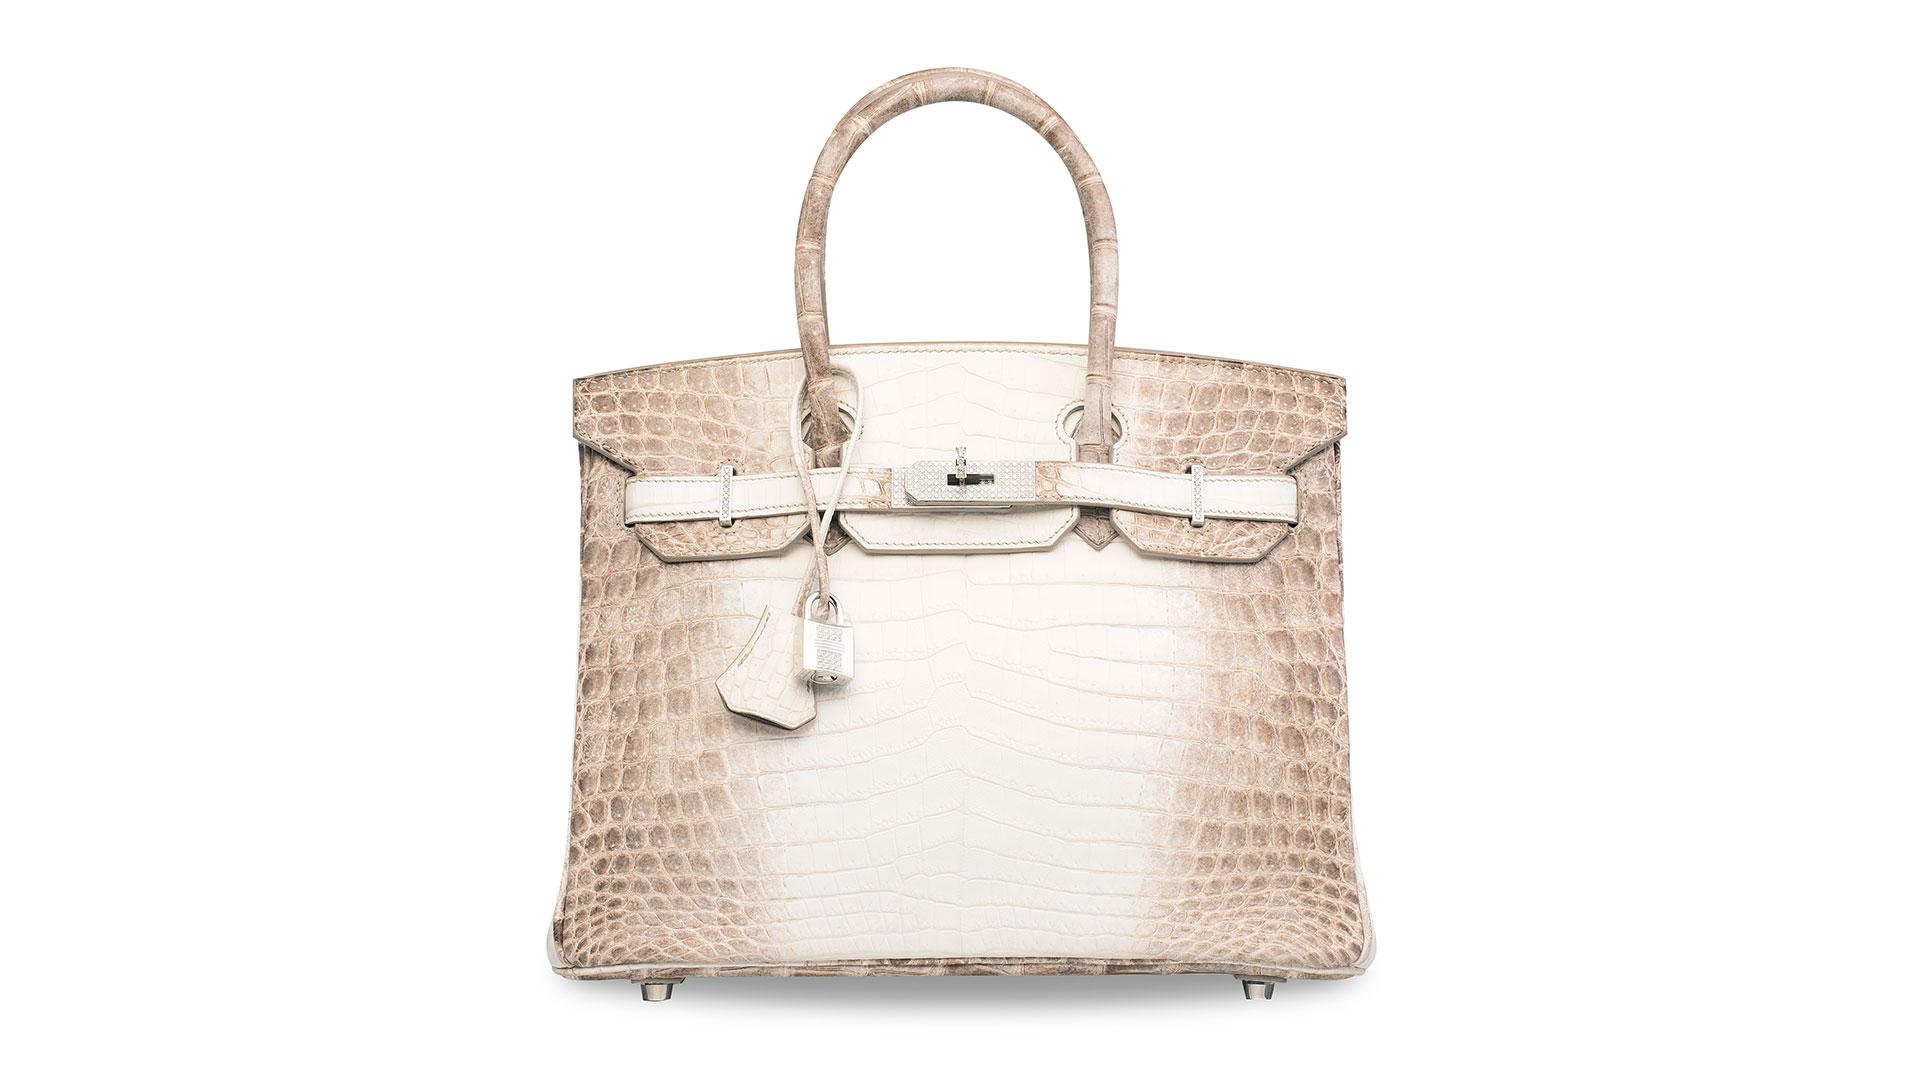 Hermés Birkin bag